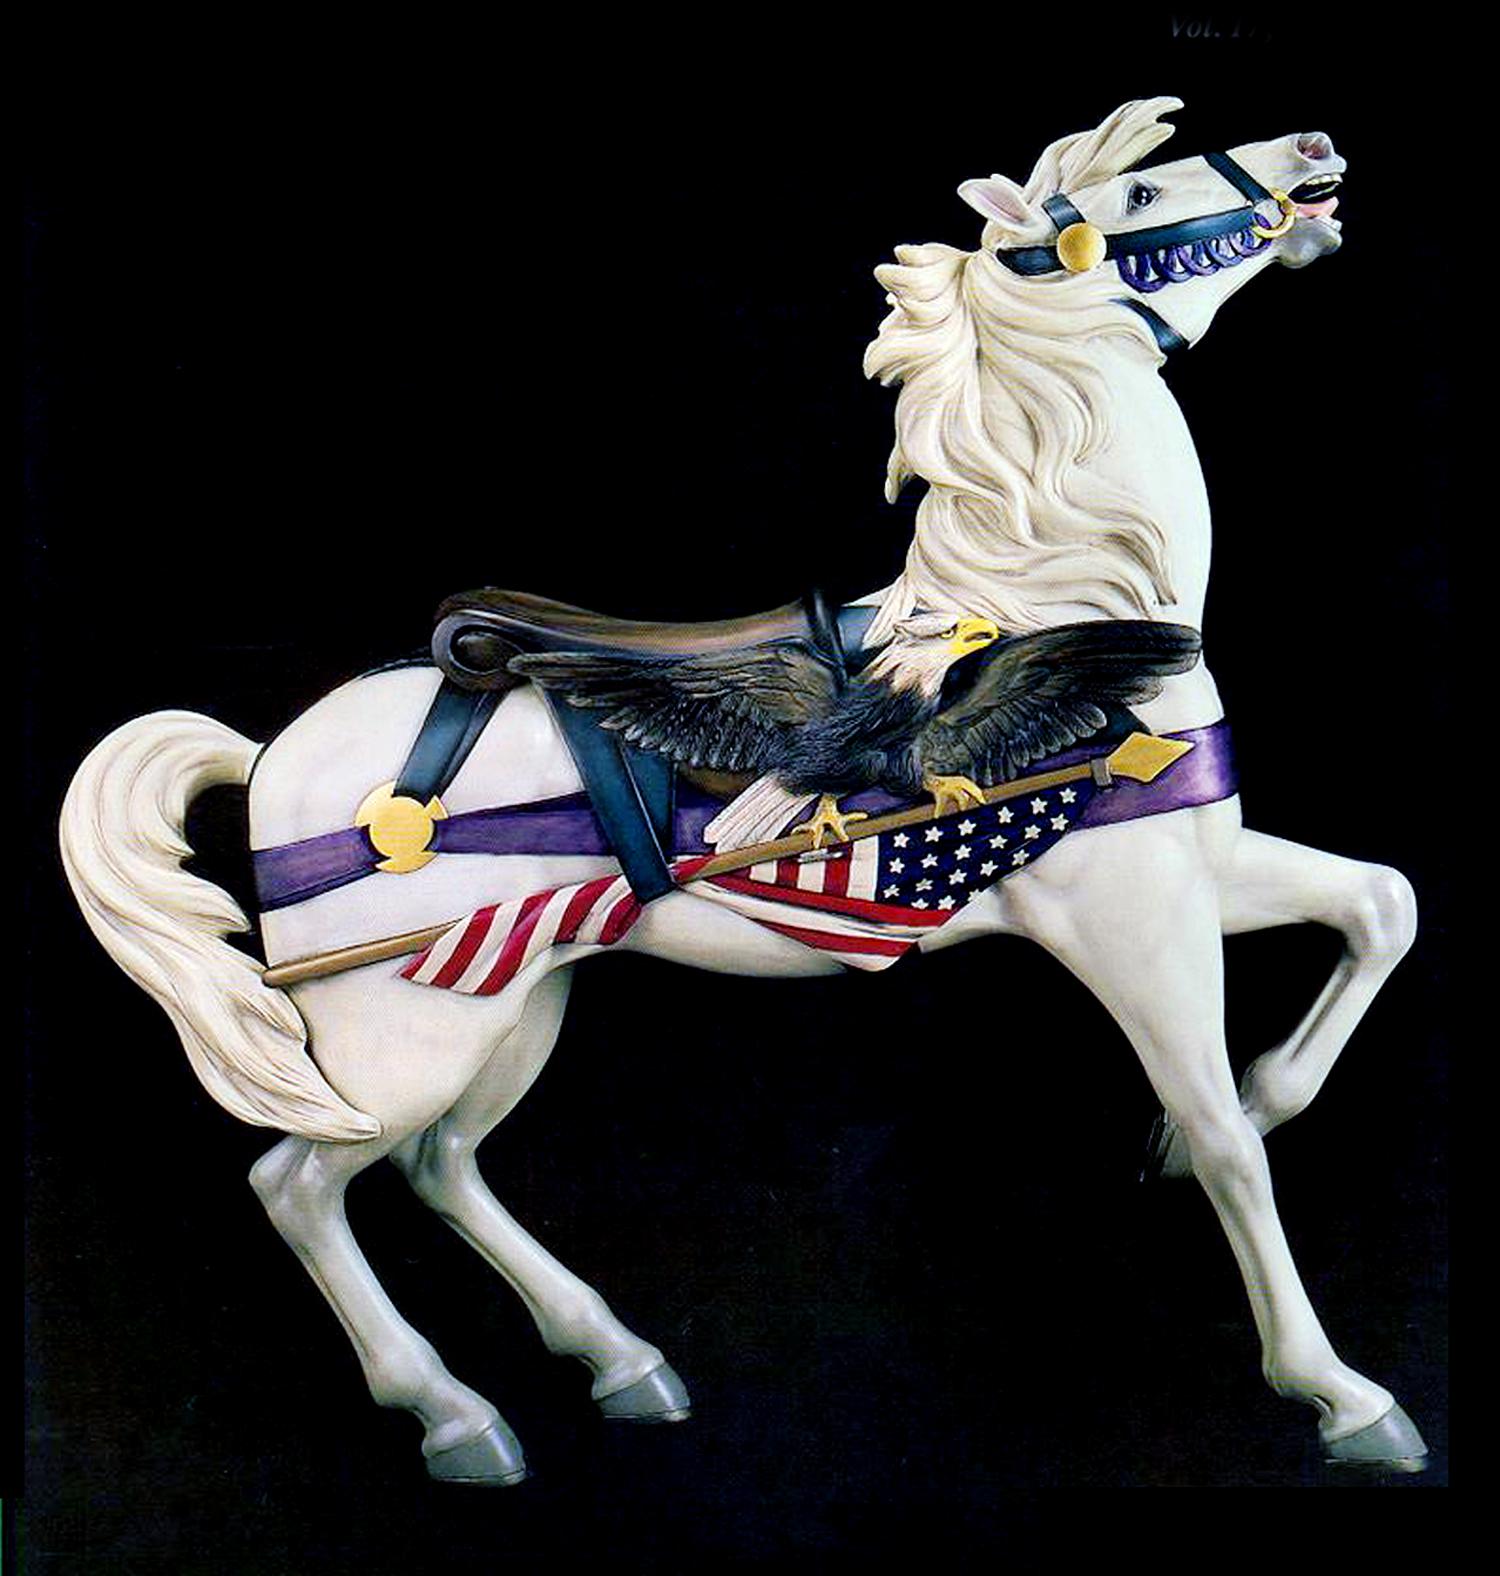 Patriotic-Dentzel-Muller-carousel-horse